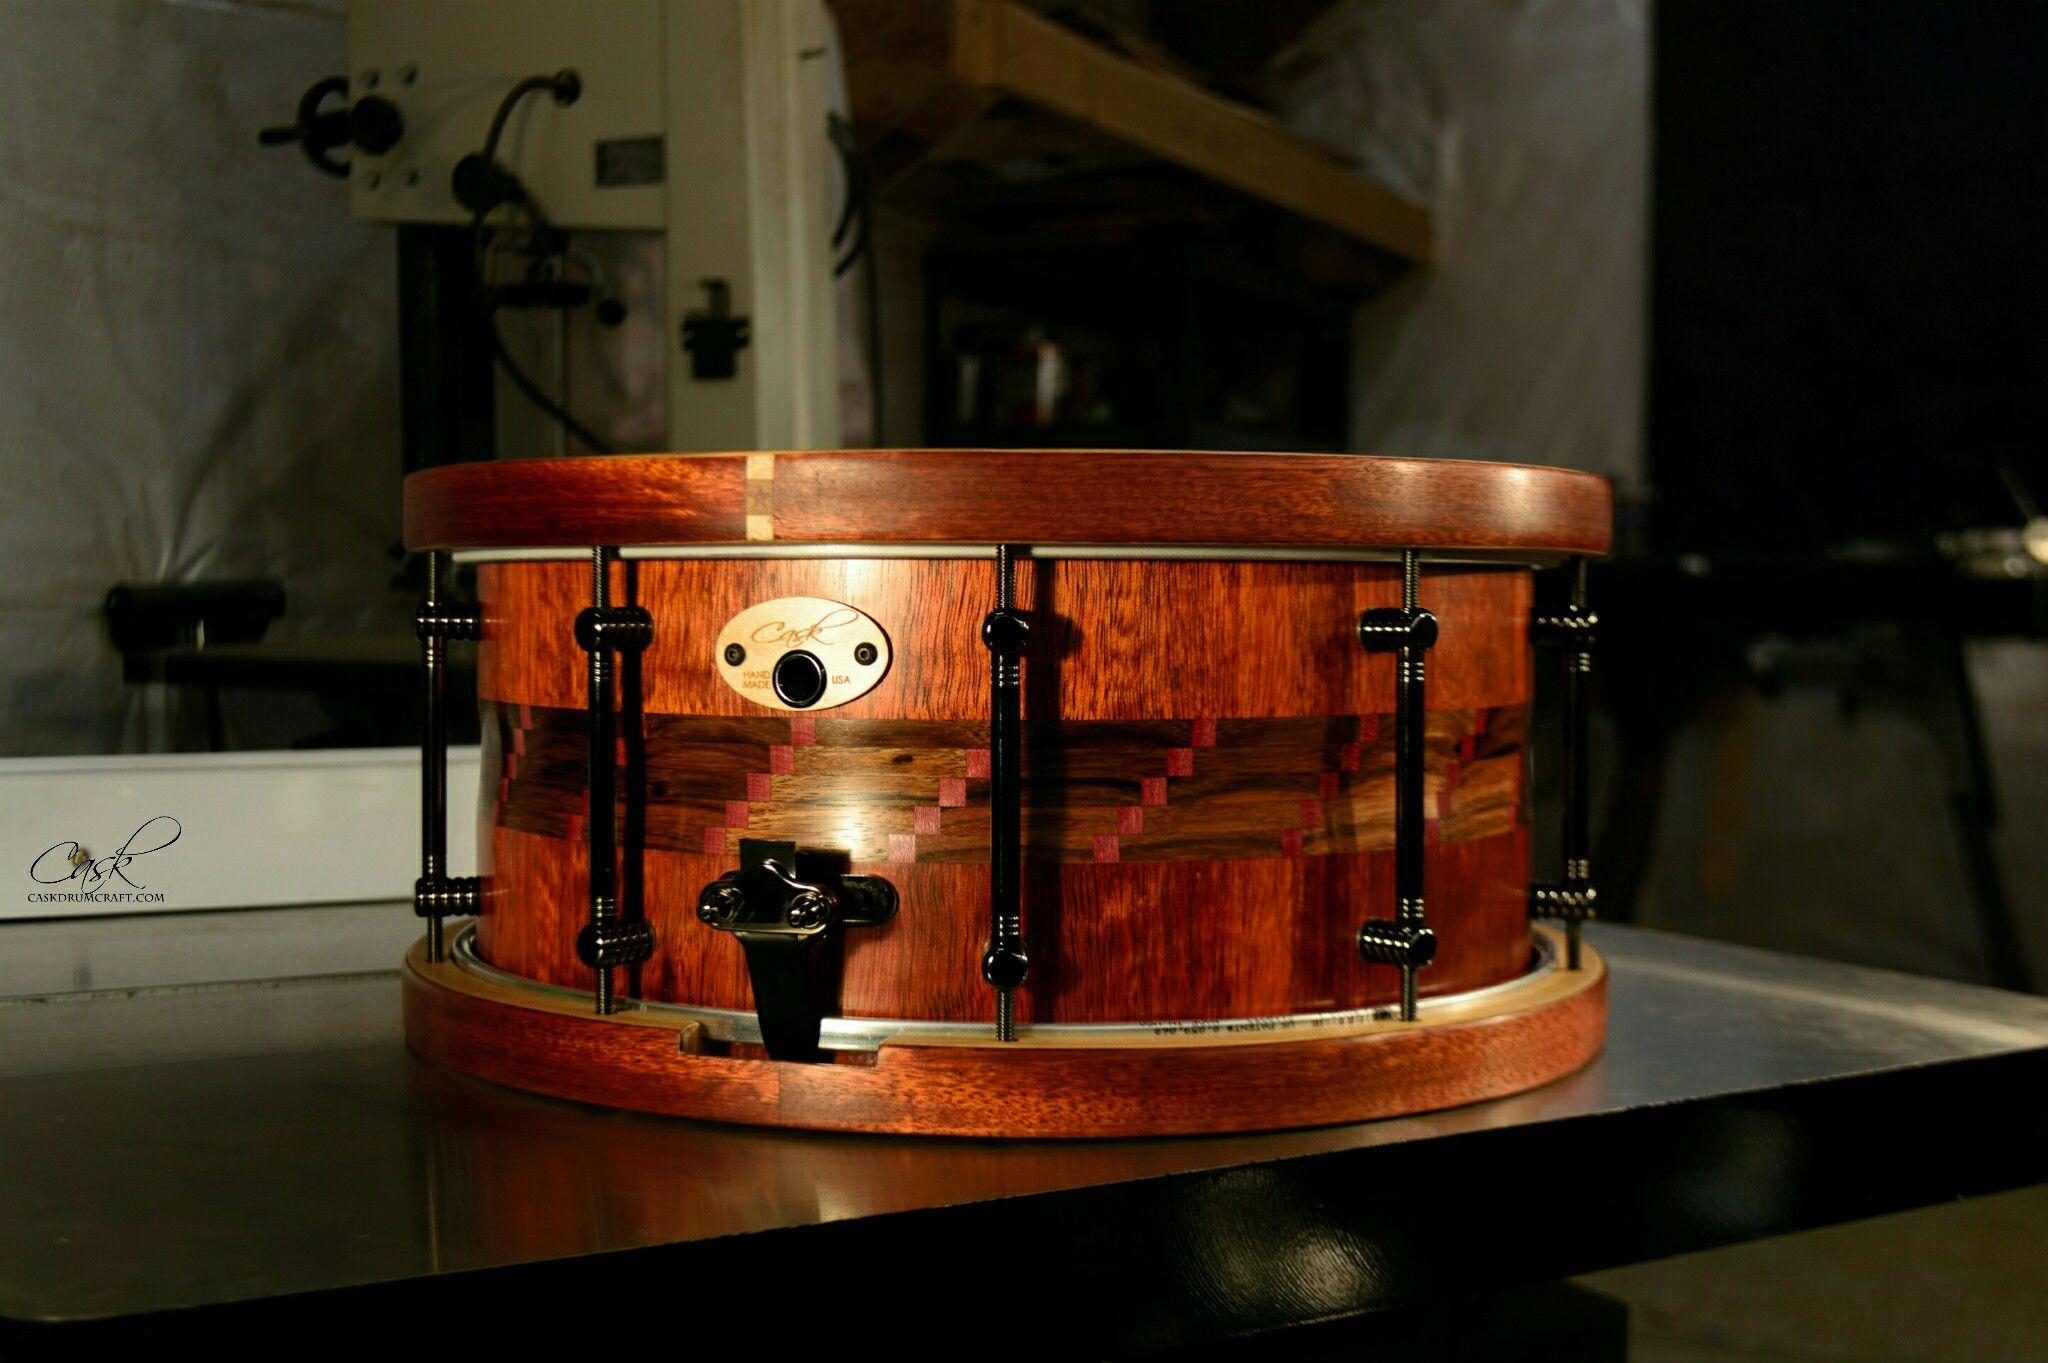 Segmented Drum Liquor Cabinet Decor Home Decor